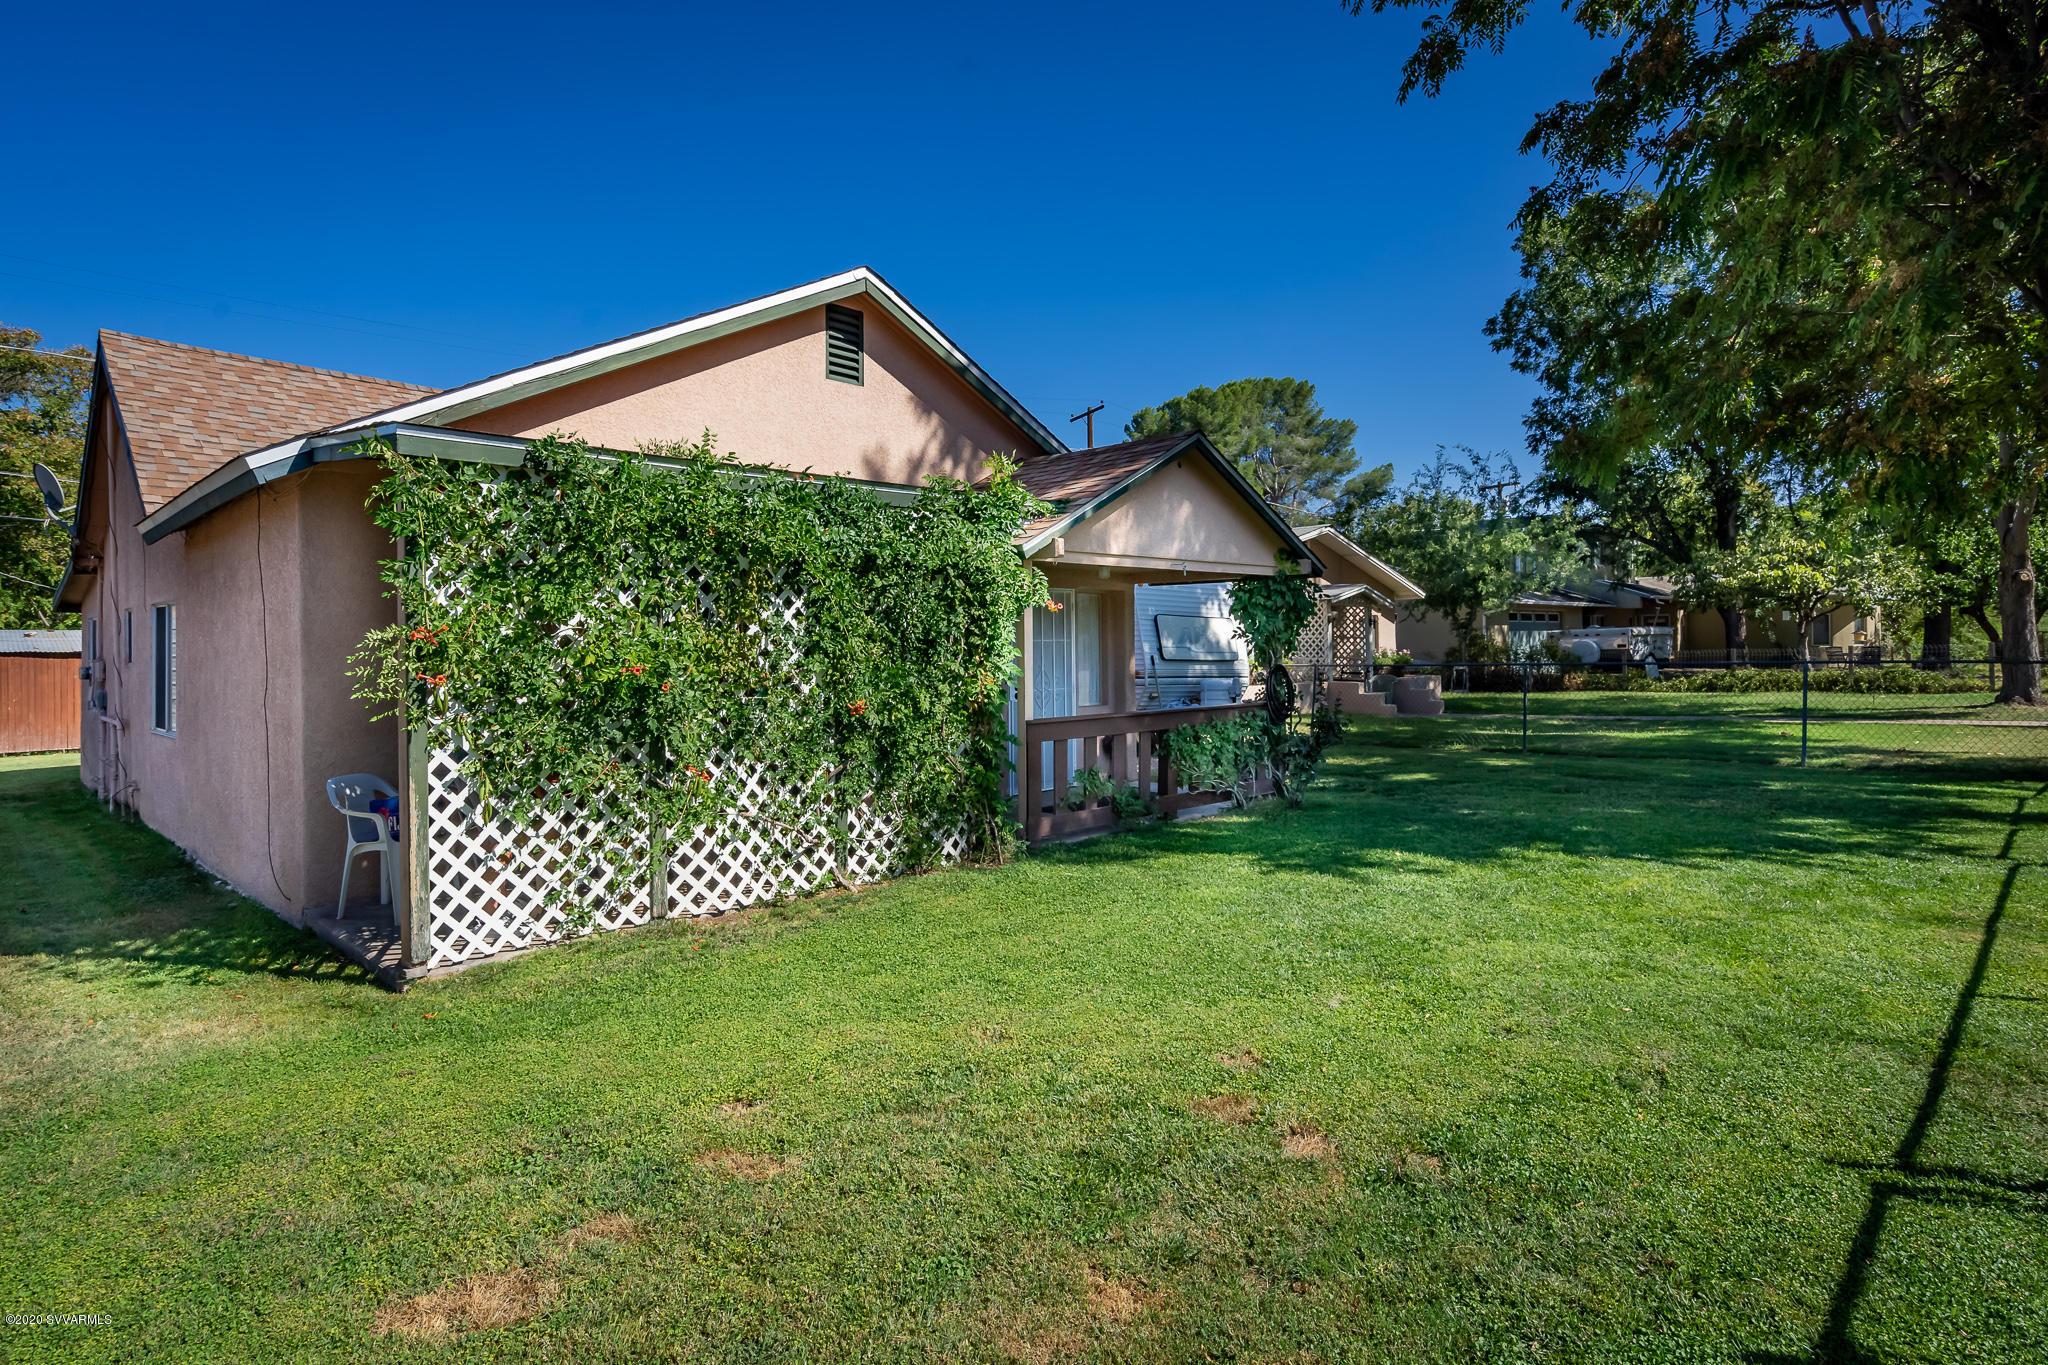 825 N 4th St Cottonwood, AZ 86326